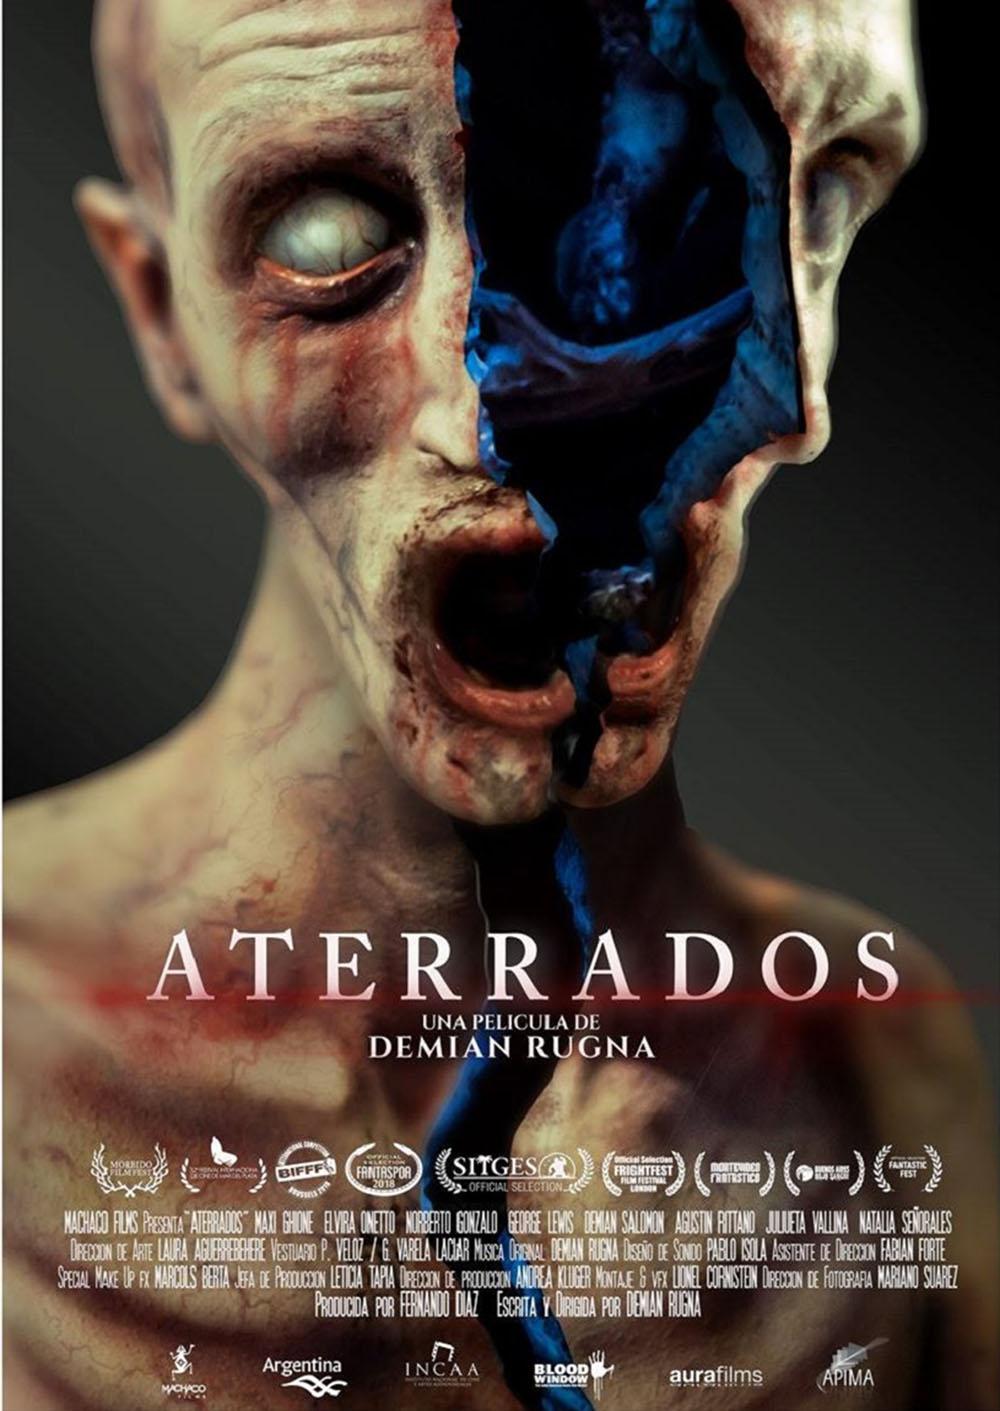 Argentina Pelicula Porno aterrados: películas similares - sensacine